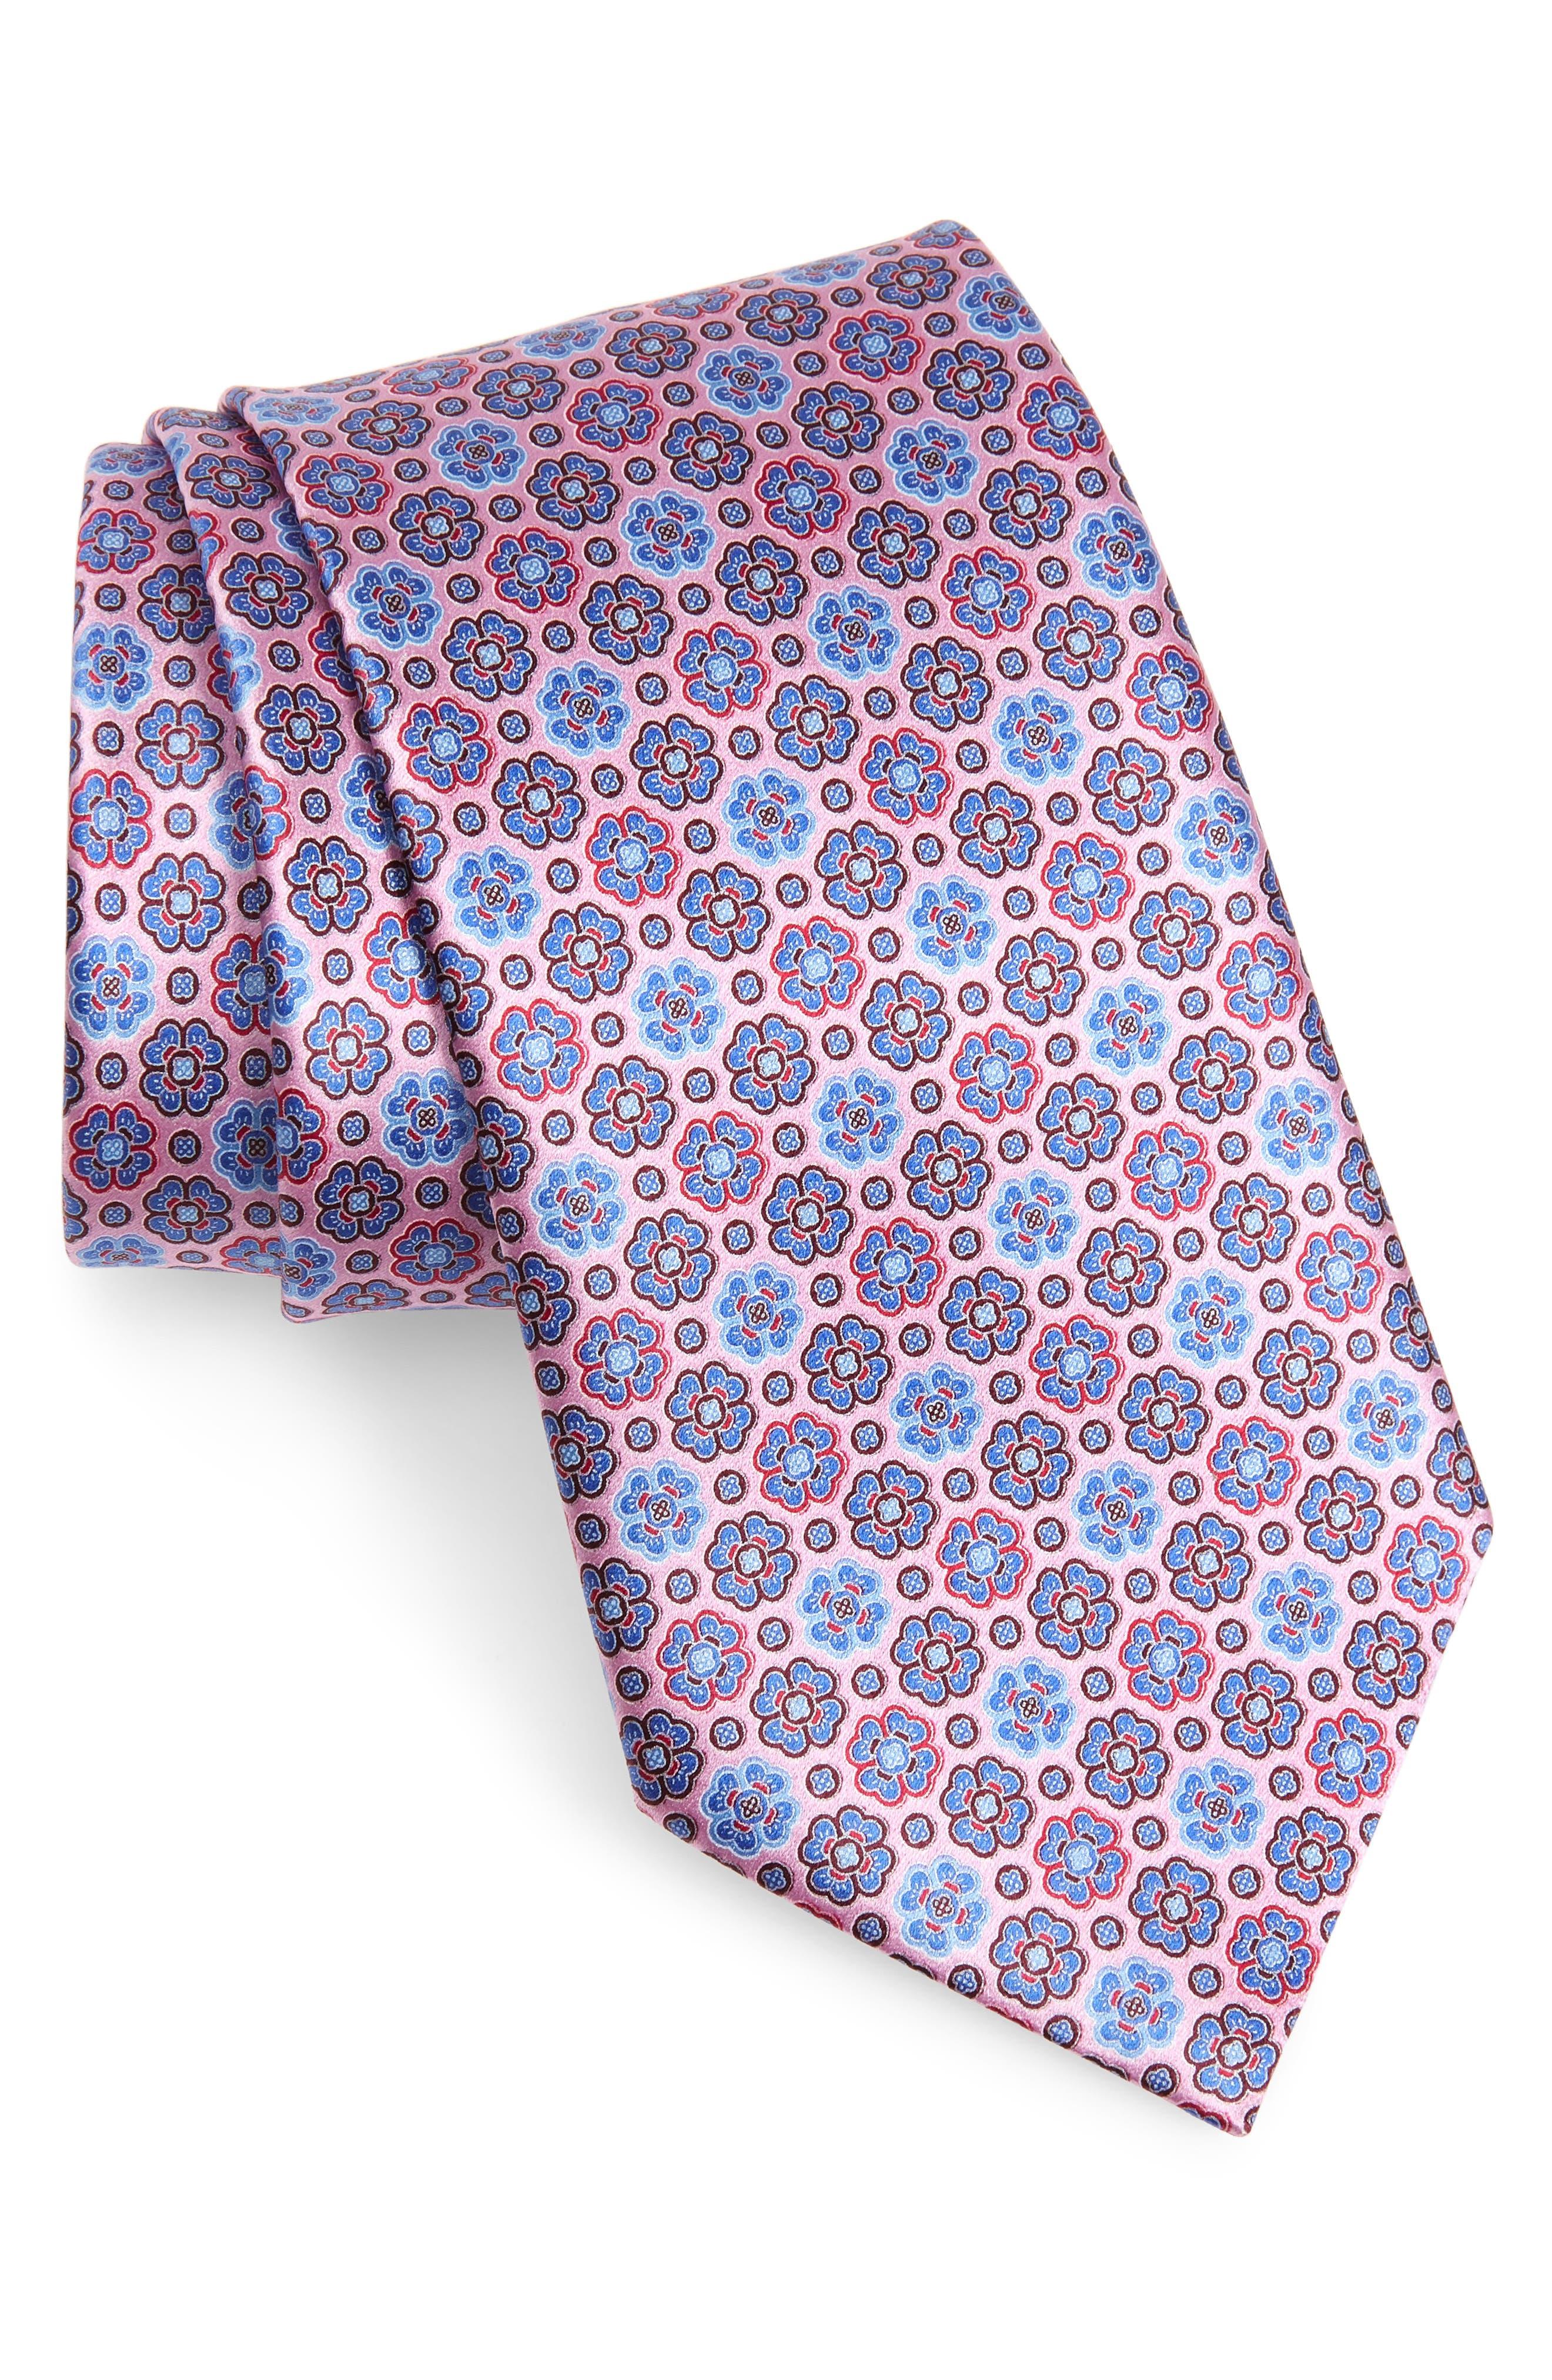 ERMENEGILDO ZEGNA, Micro Floral Silk Tie, Main thumbnail 1, color, PINK